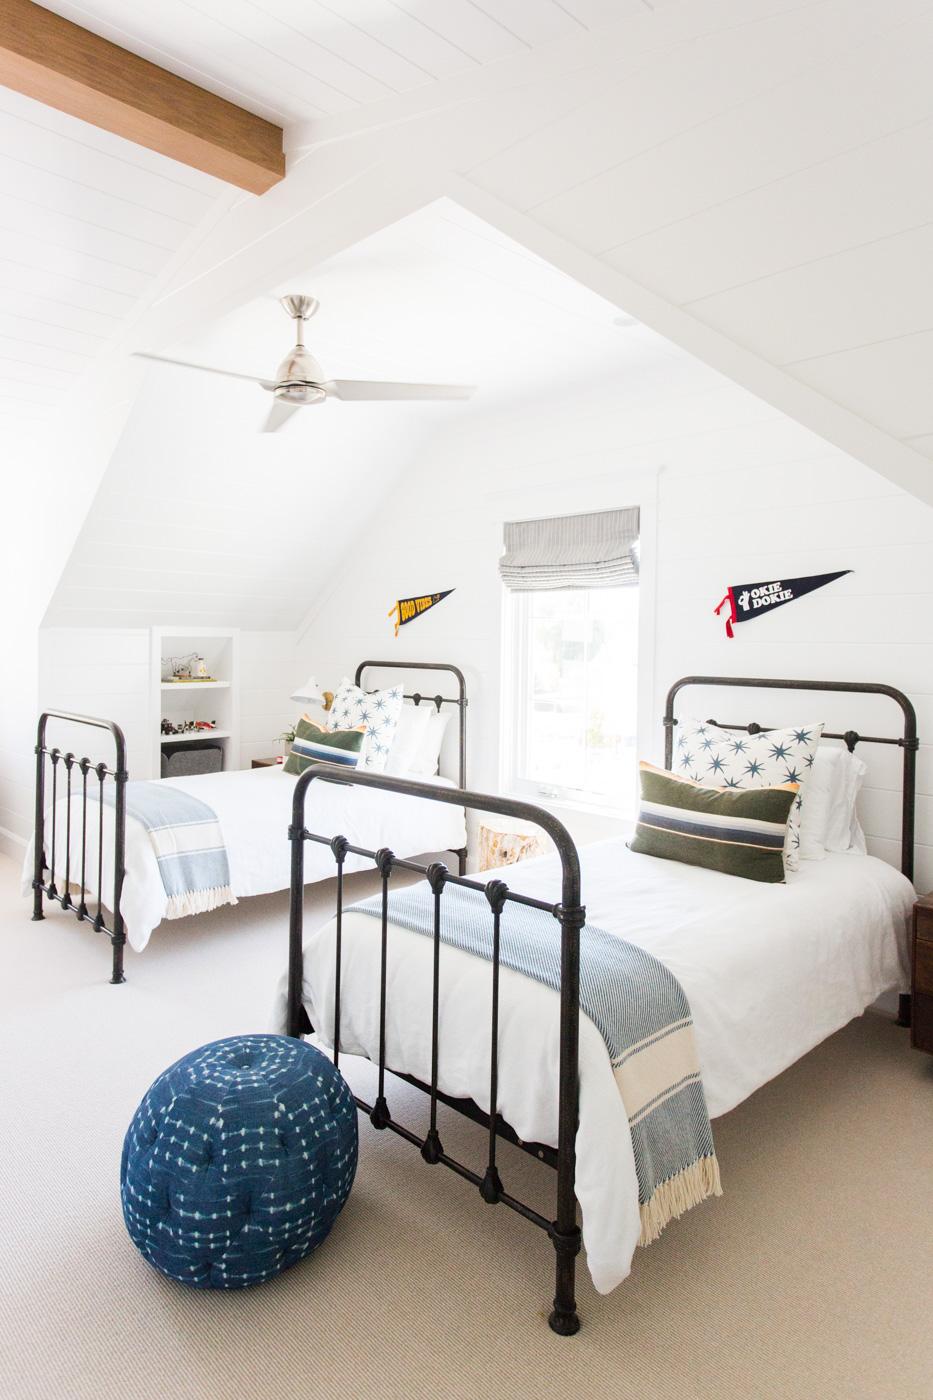 Boys'+room+with+twin+iron+beds+||+Studio+McGee.jpg